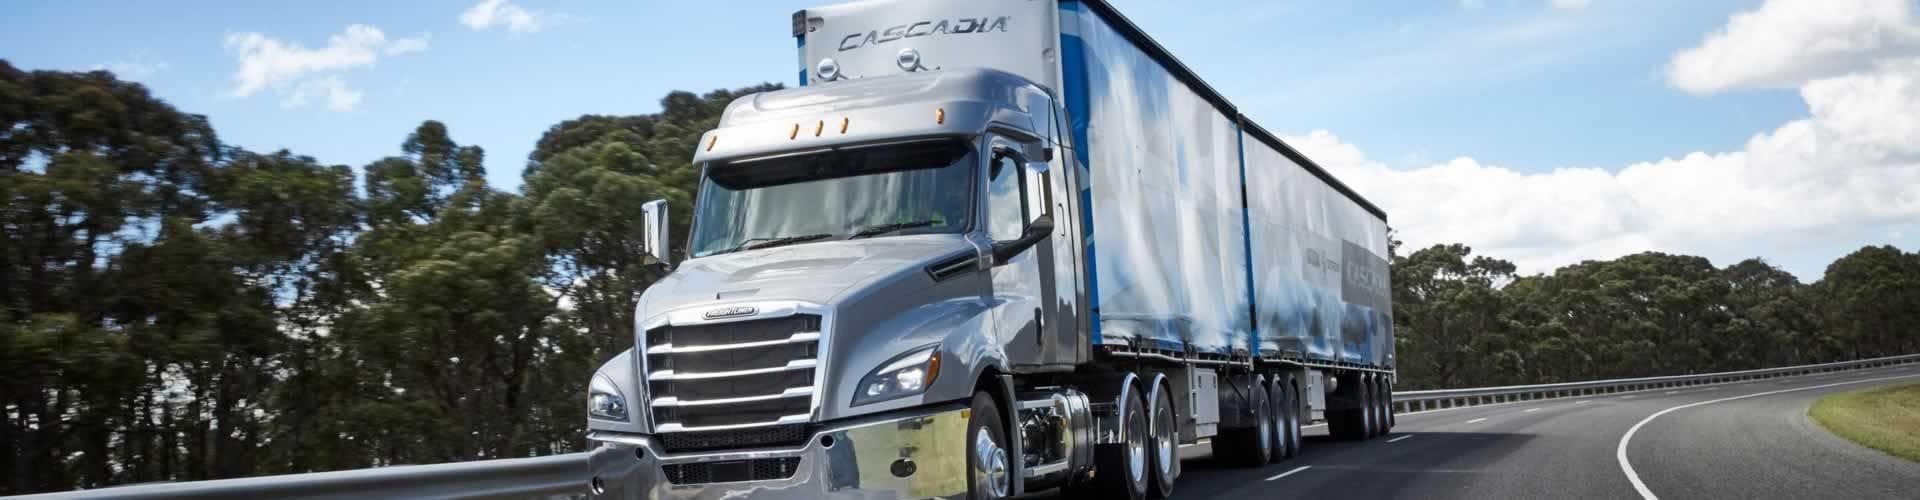 Freightliner Cascadia | Daimler Trucks Albury & Wagga Wagga